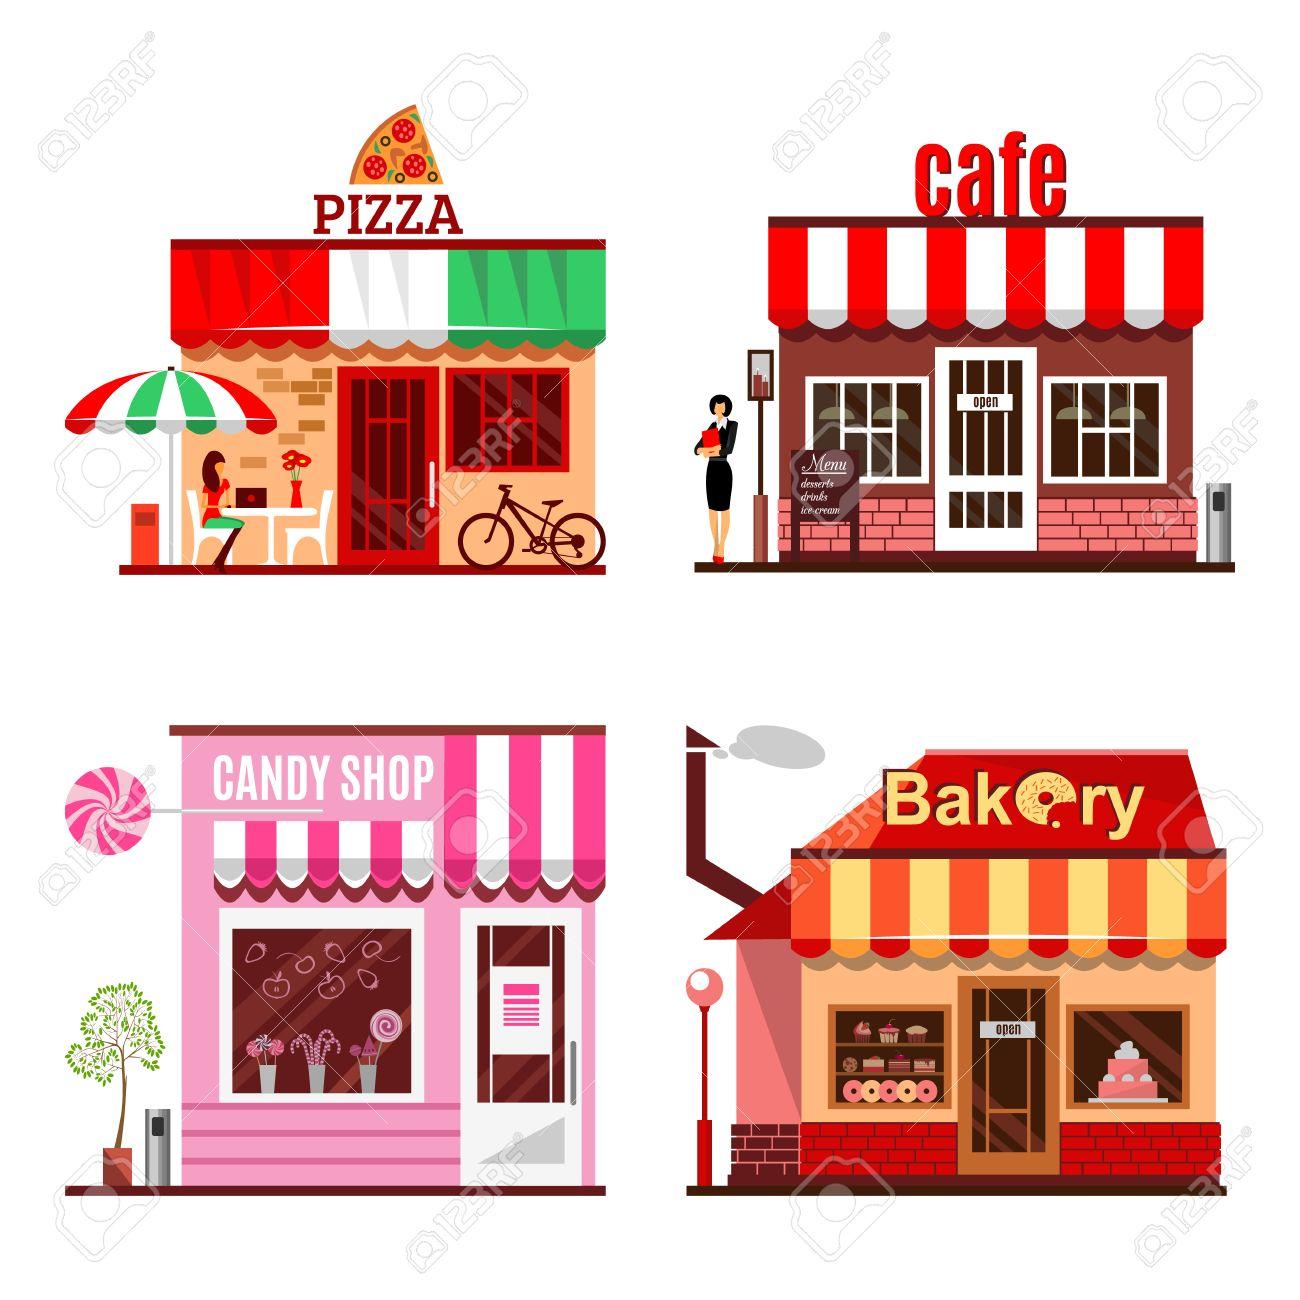 Building cartoon clipart restaurant building and restaurant building - Pizza House Cool Set Of Detailed Flat Design City Public Buildings Restaurants And Shops